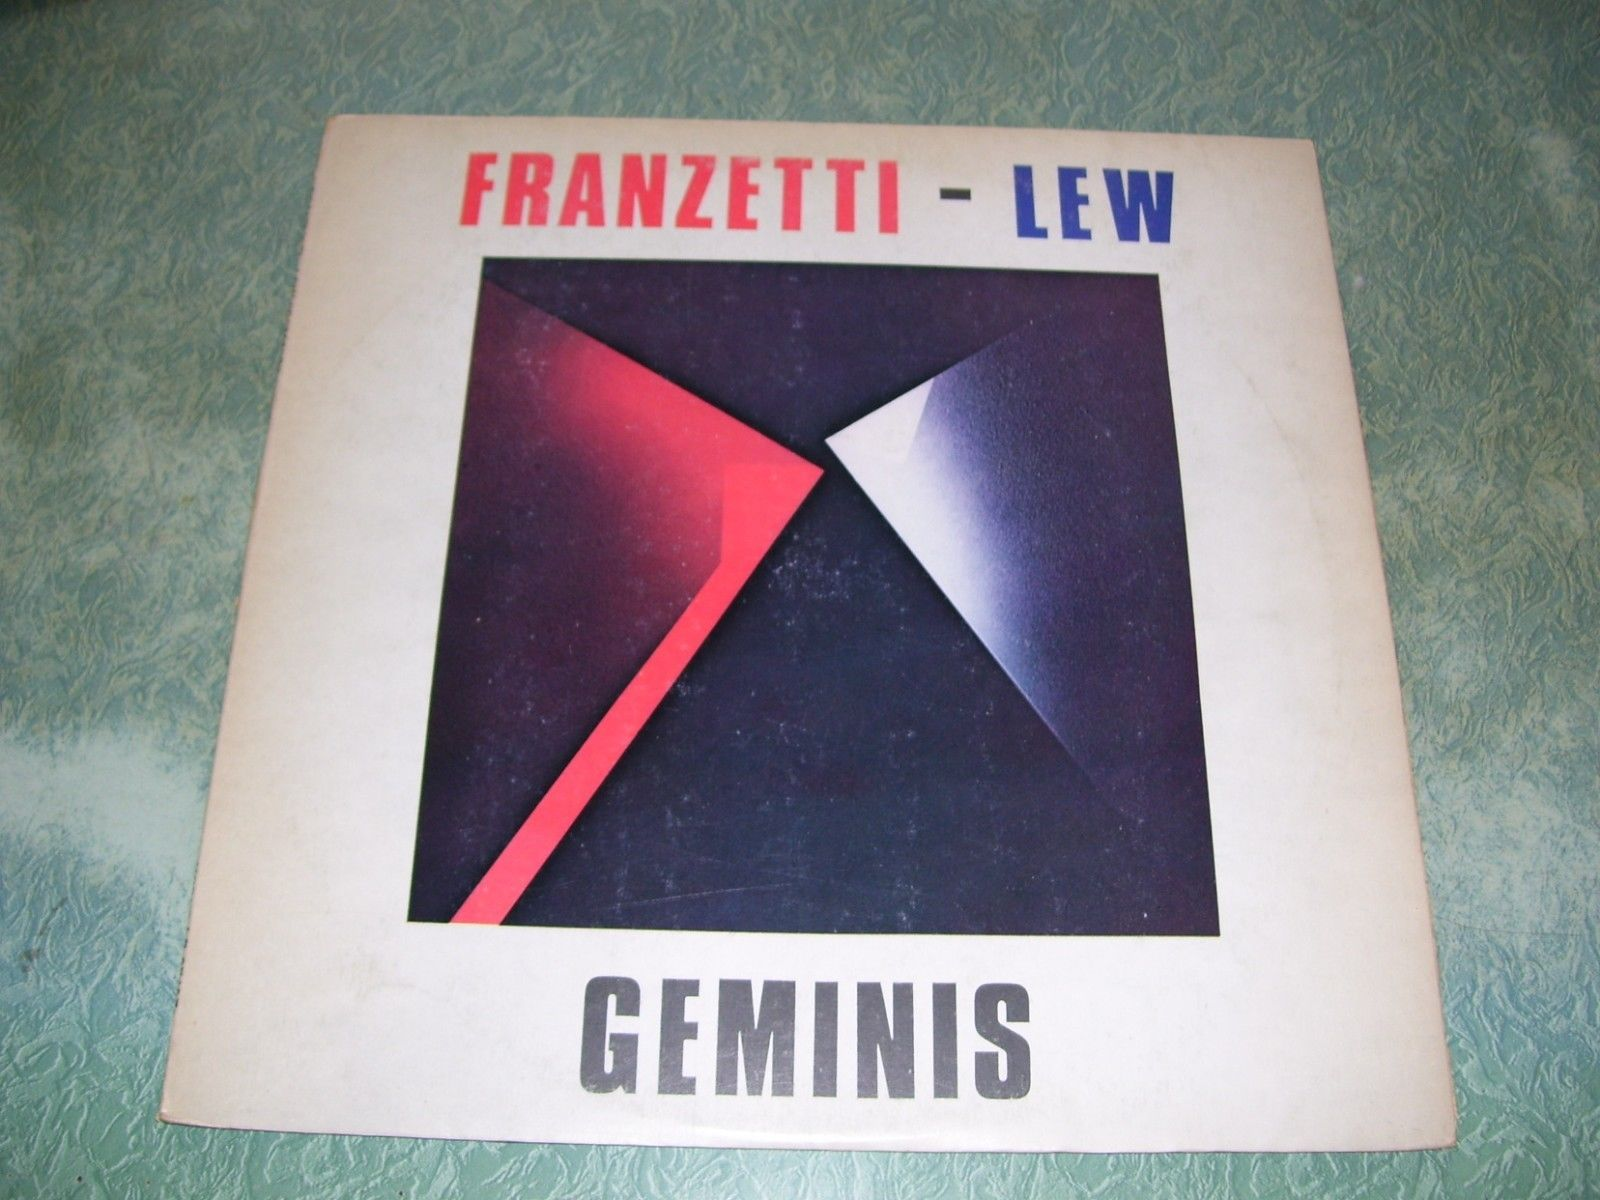 CARLOS FRANZETTI - Geminis cover